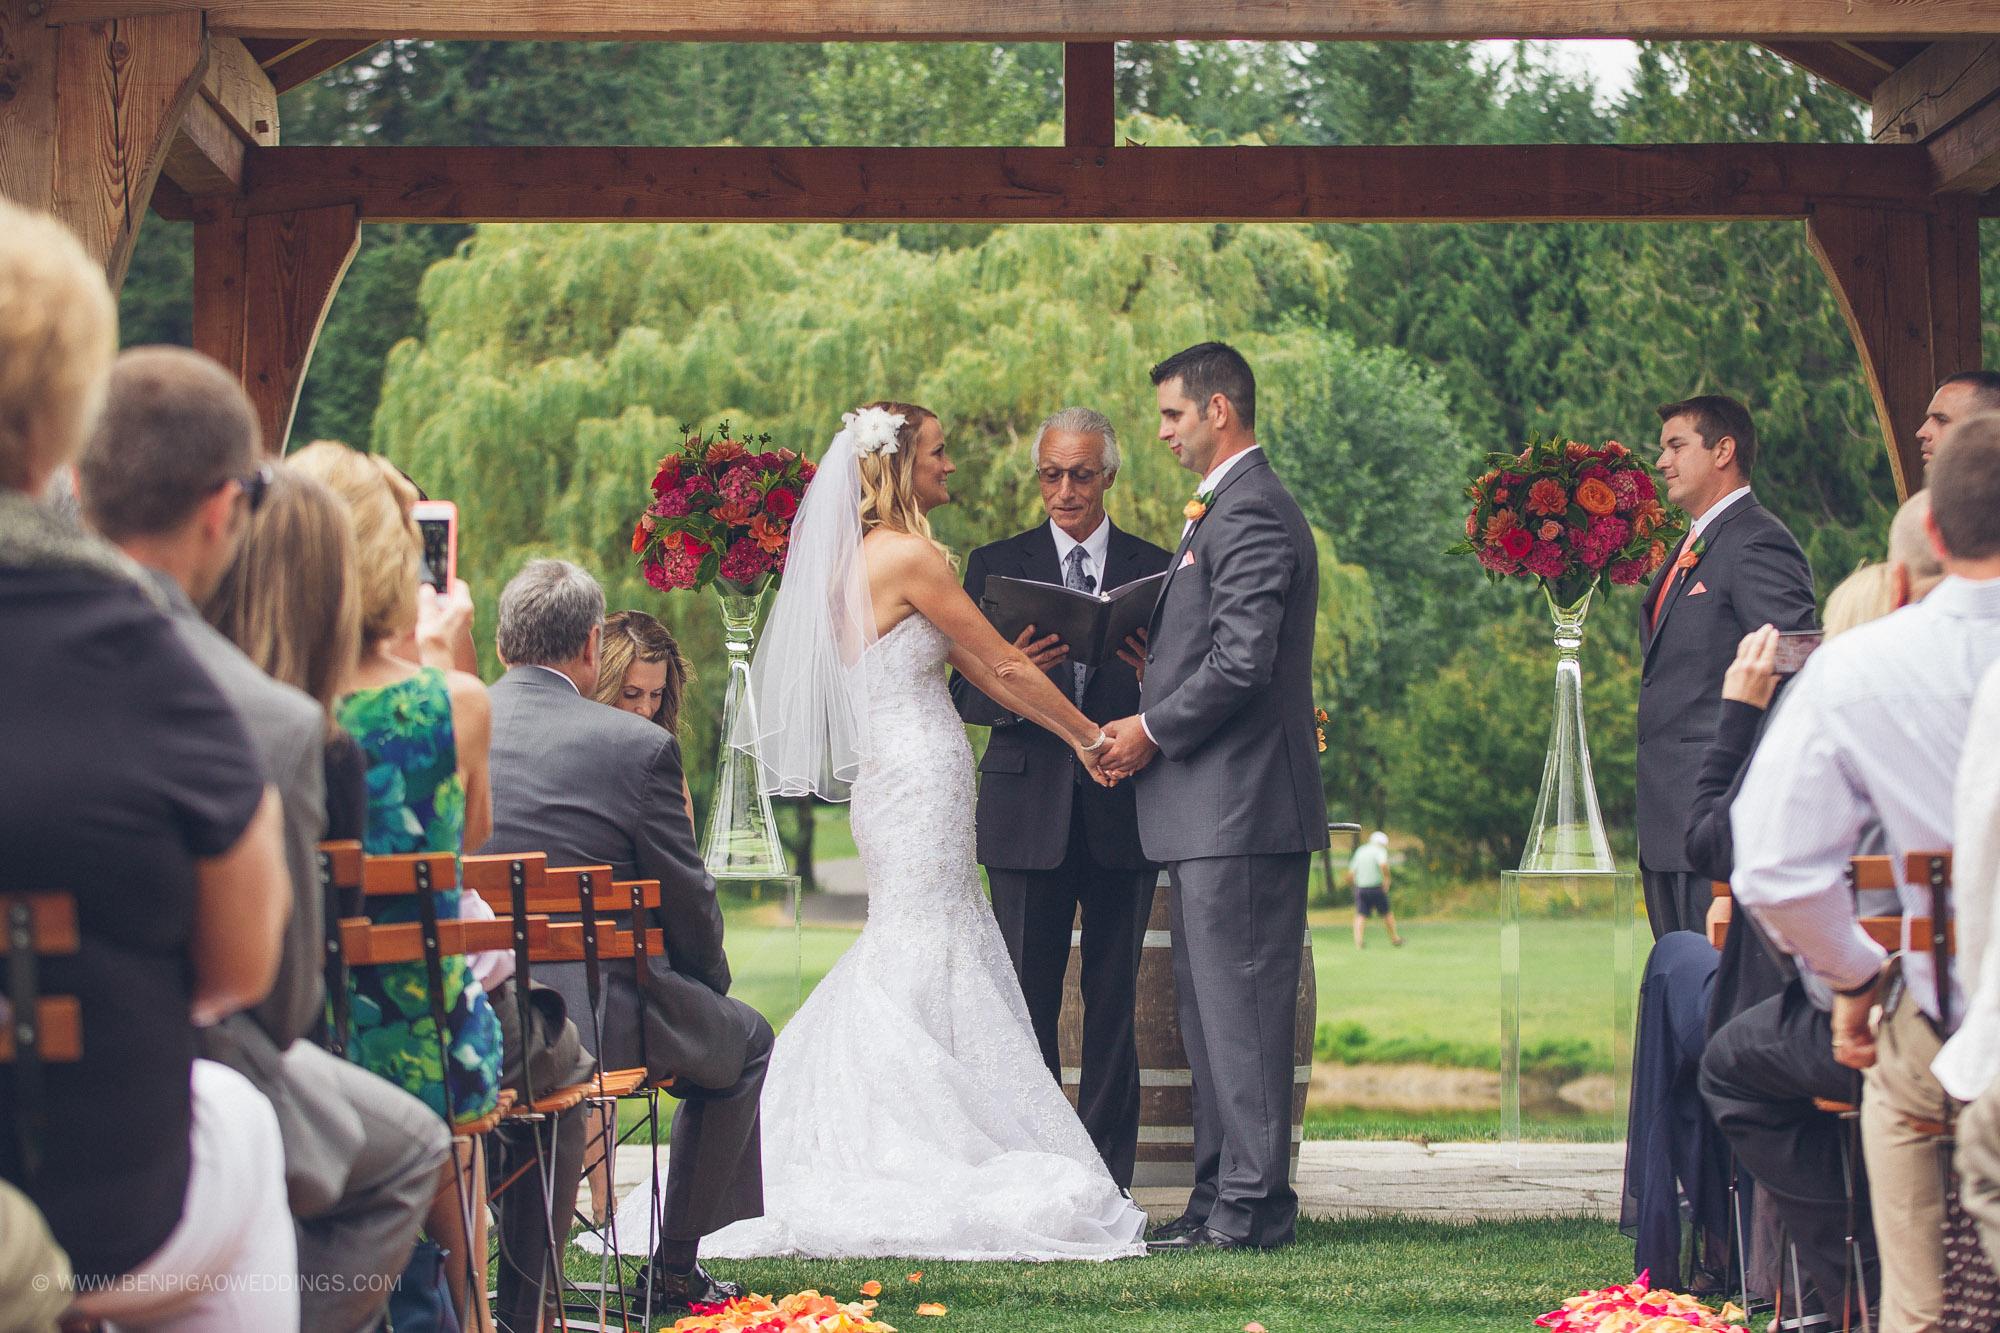 Bridalbliss.com | Mt. Hood Wedding | Oregon Event Planning and Design | Ben Pigao Photography